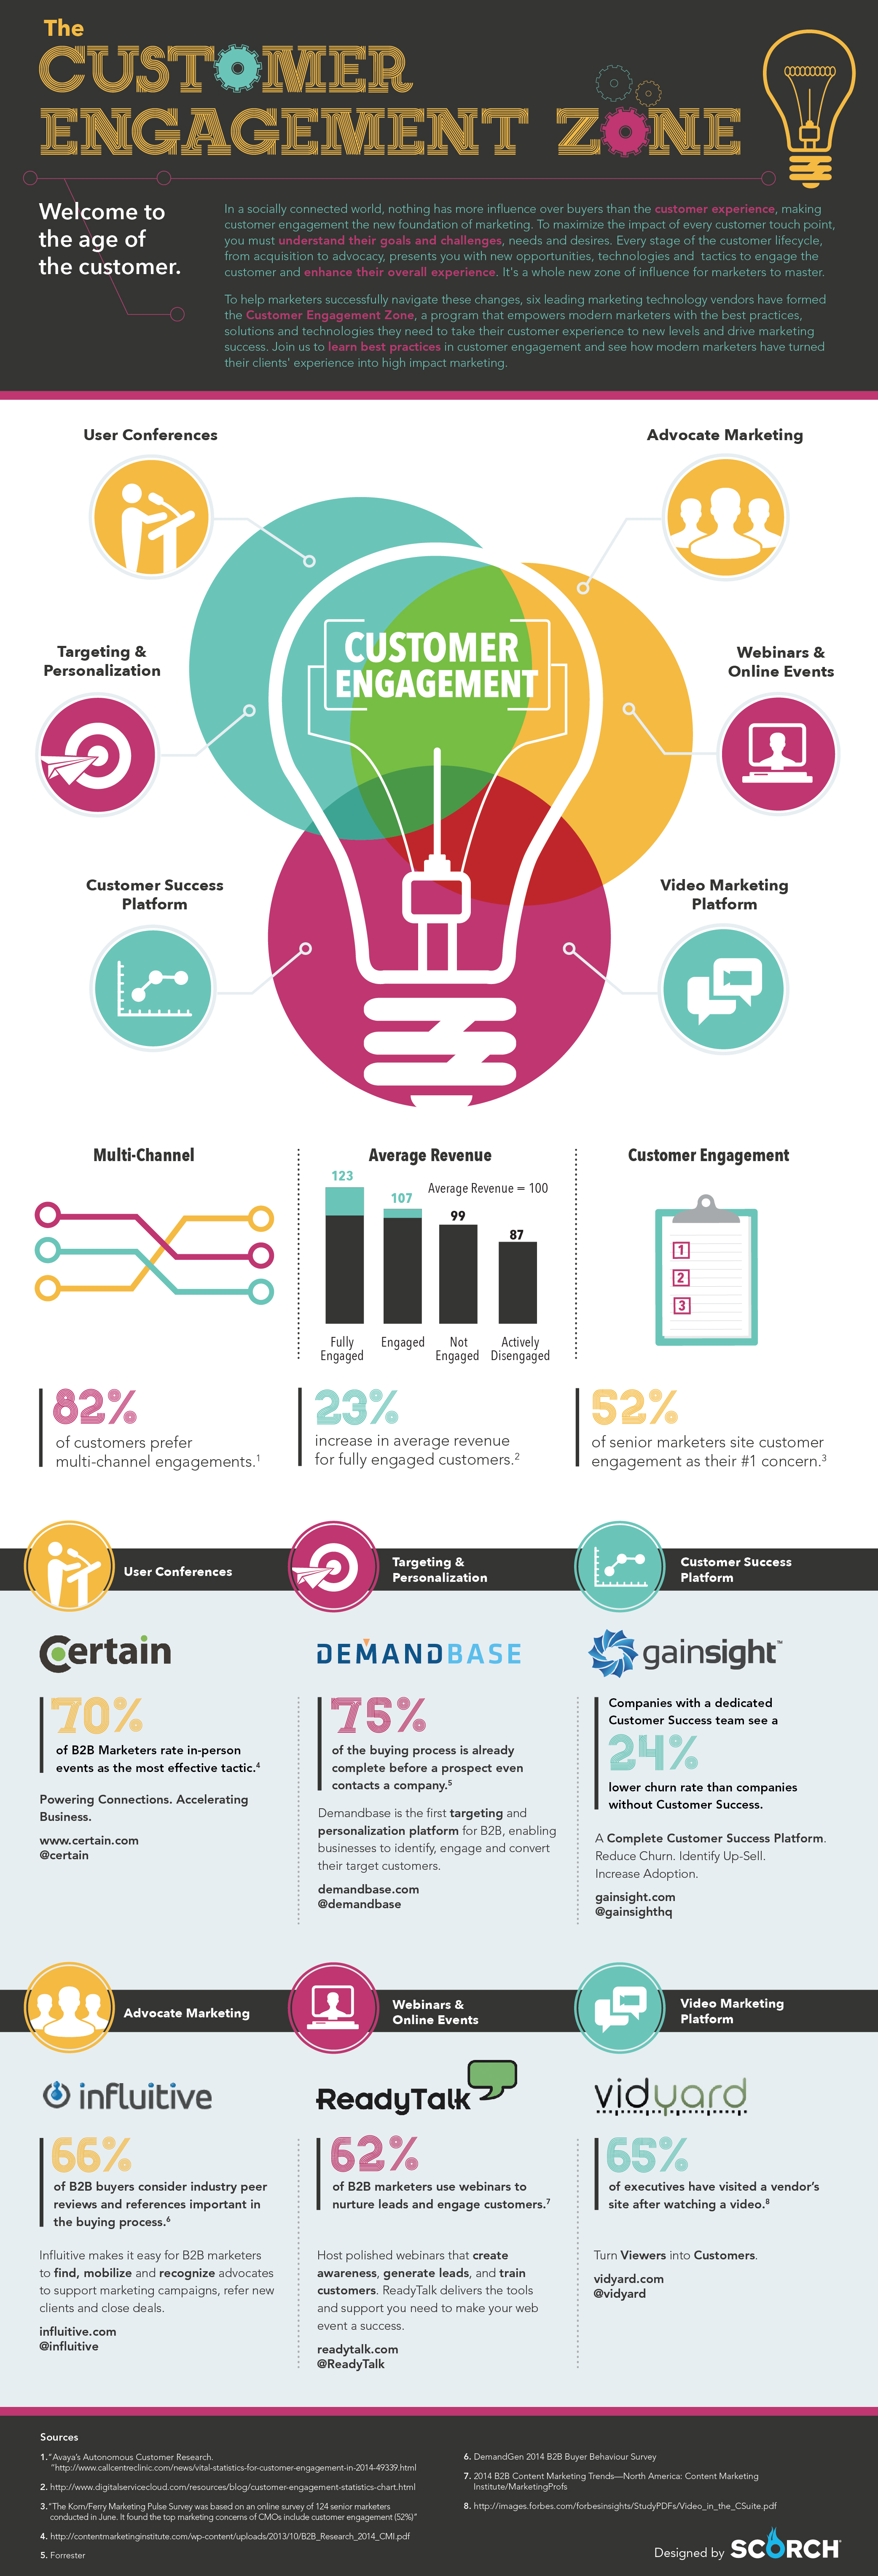 The Customer Engagement Zone